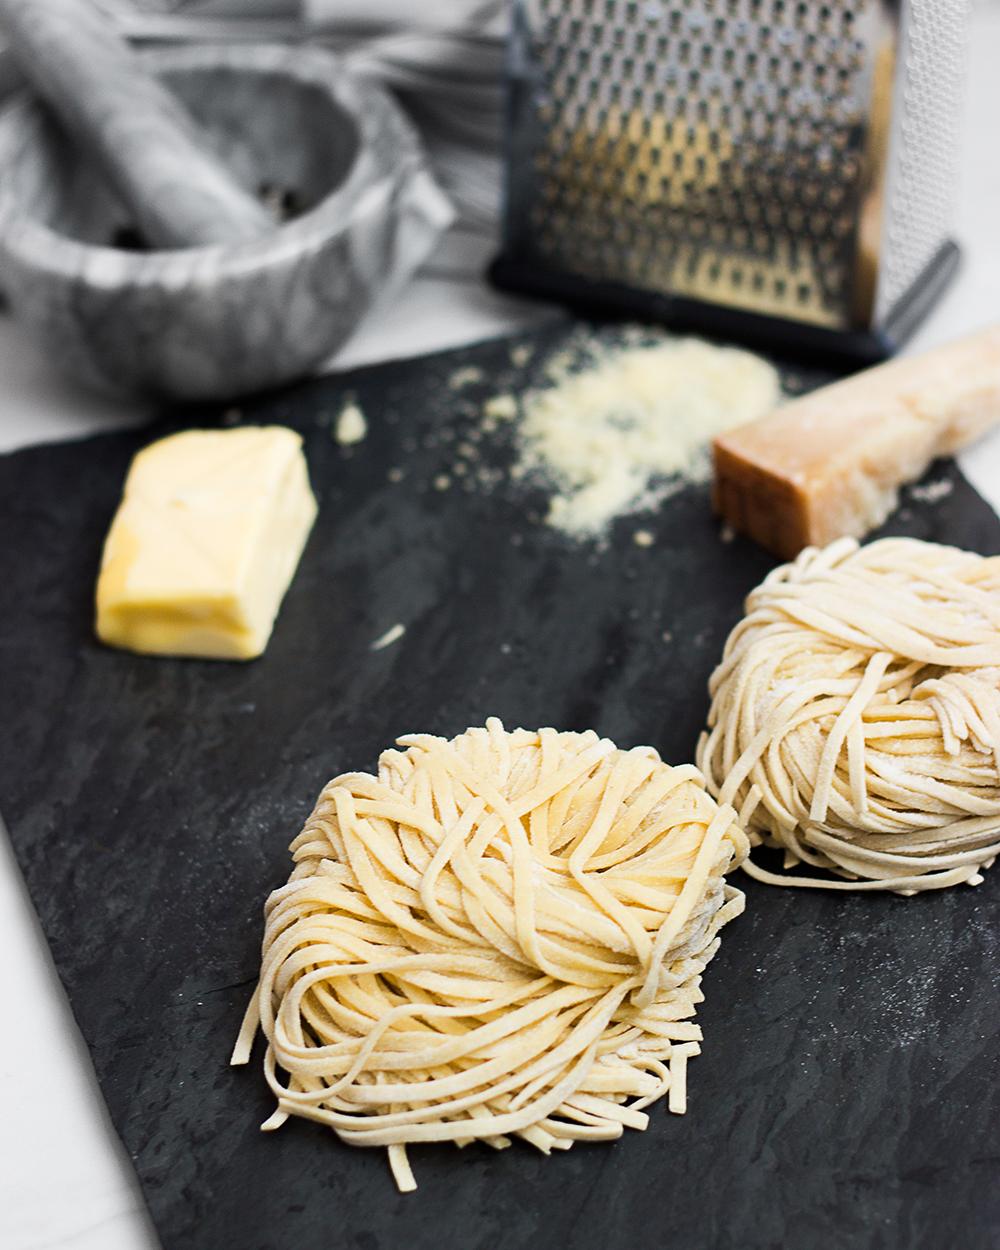 livvyland-blog-olivia-watson-austin-texas-lifestyle-blogger-summer-cacio-e-pepe-pasta-recipe-jessica-lee-2